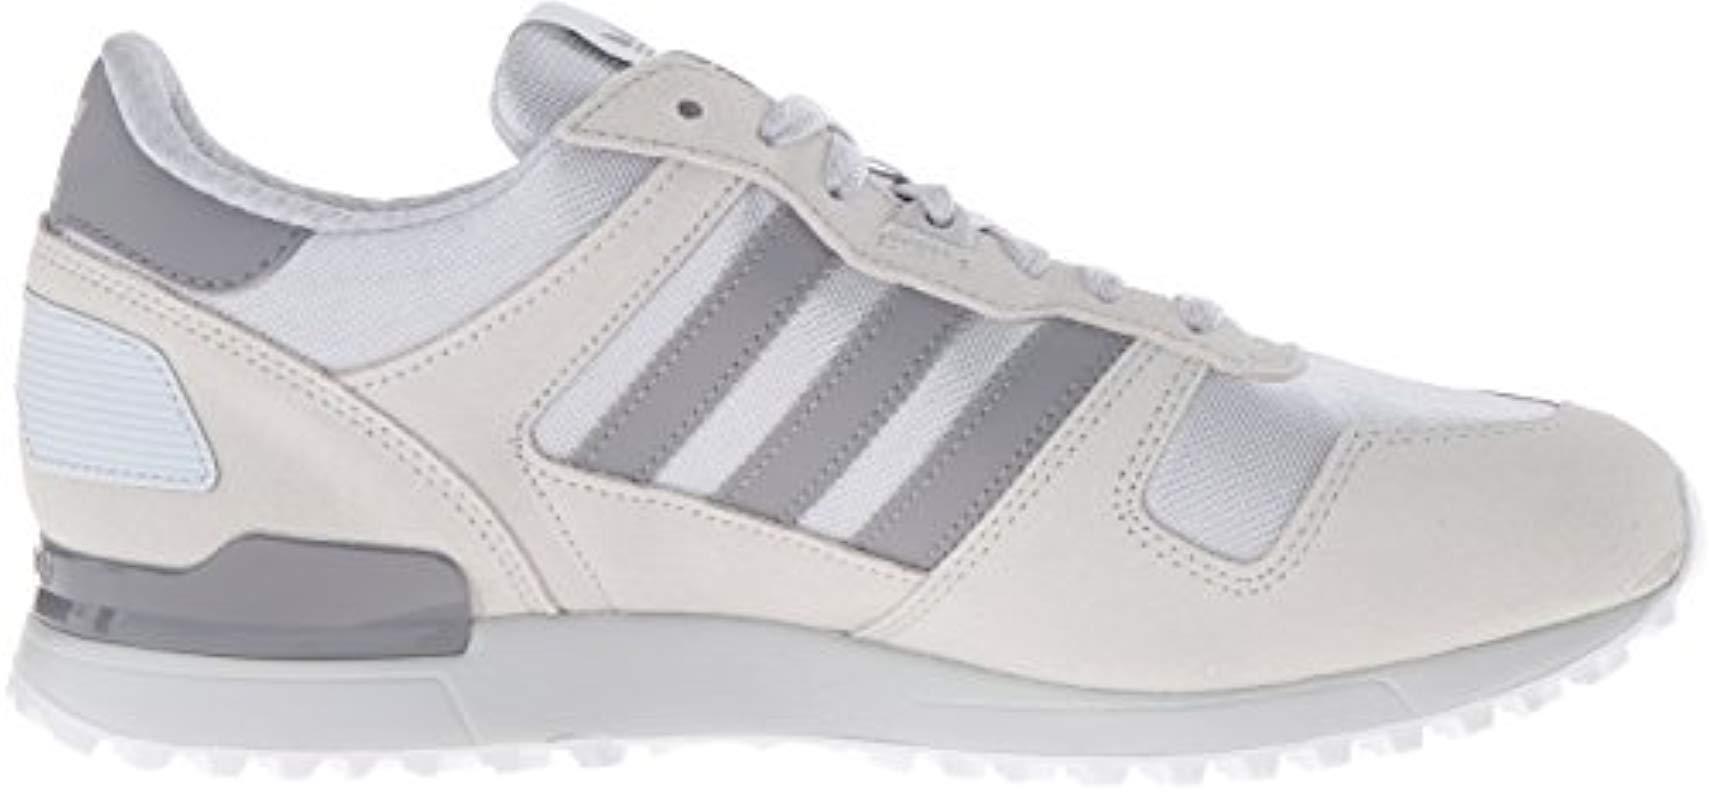 Zx 700 Lifestyle Runner Sneaker